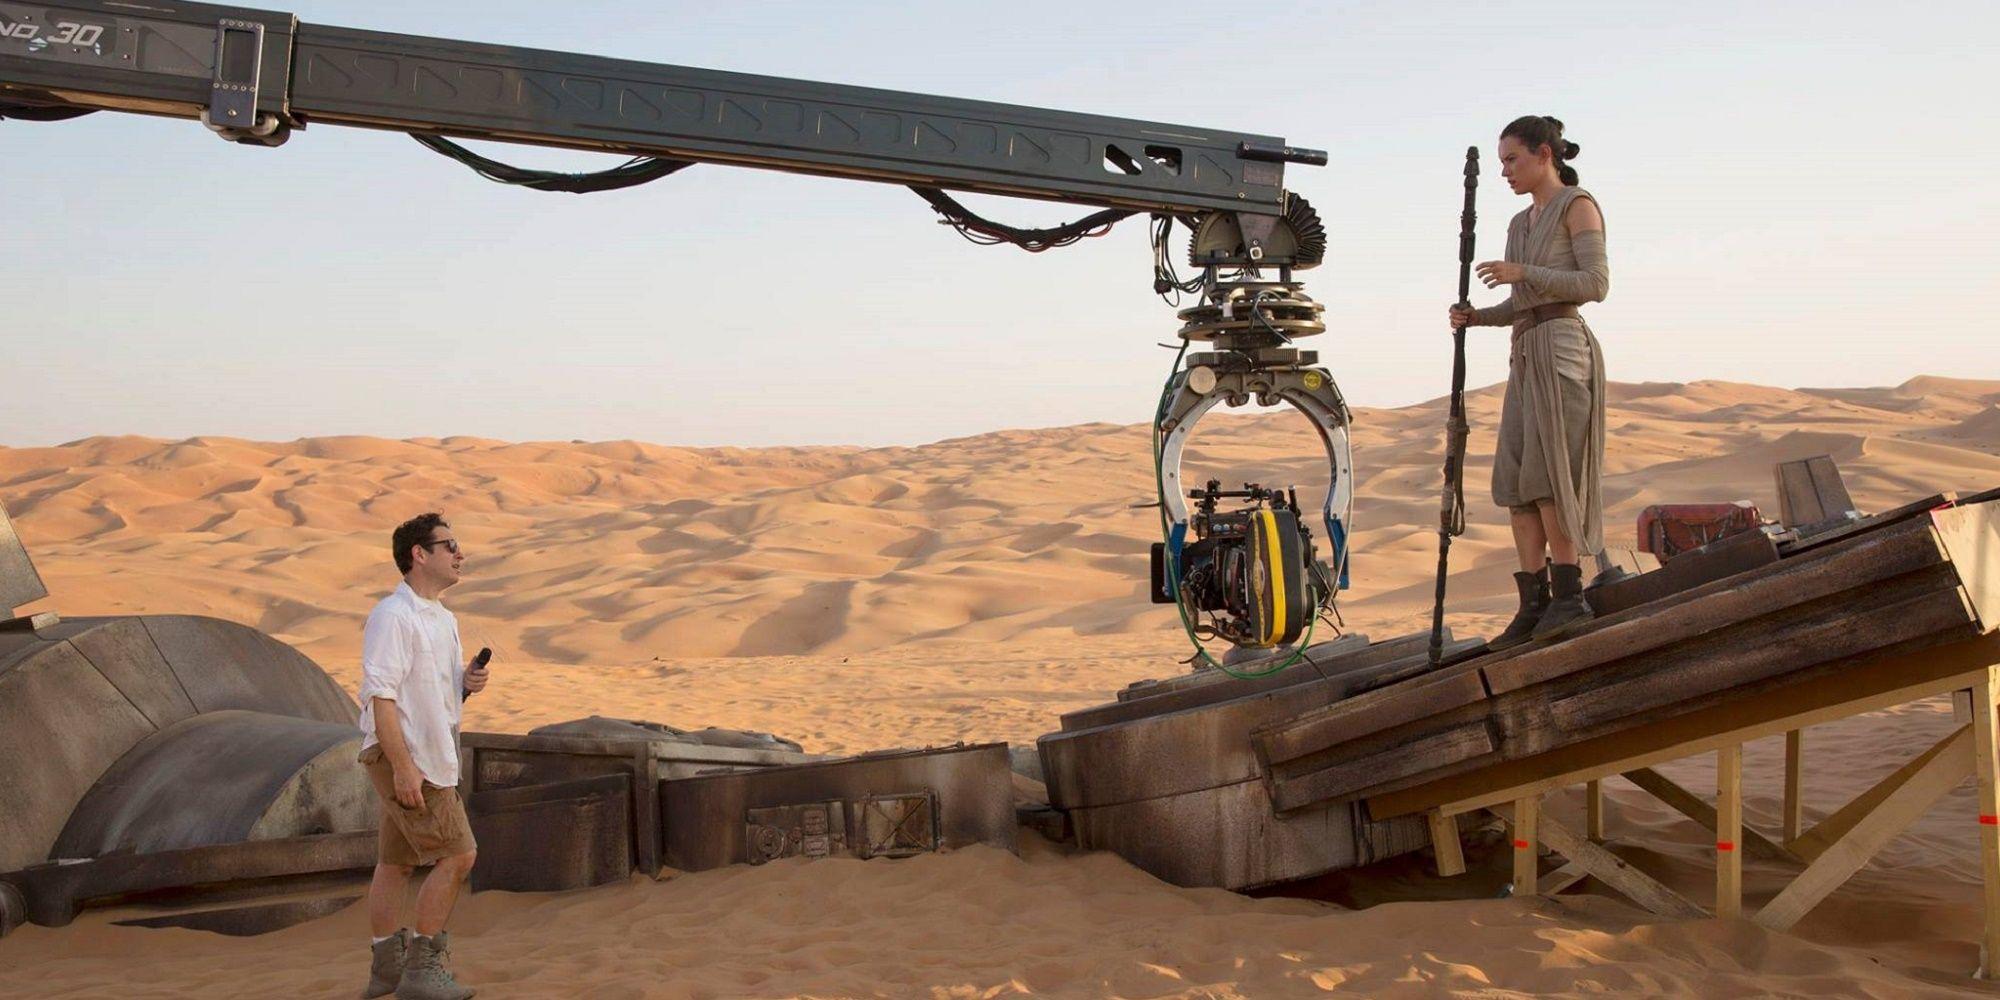 Star Wars 9: Director Colin Trevorrow Will Shoot on Film